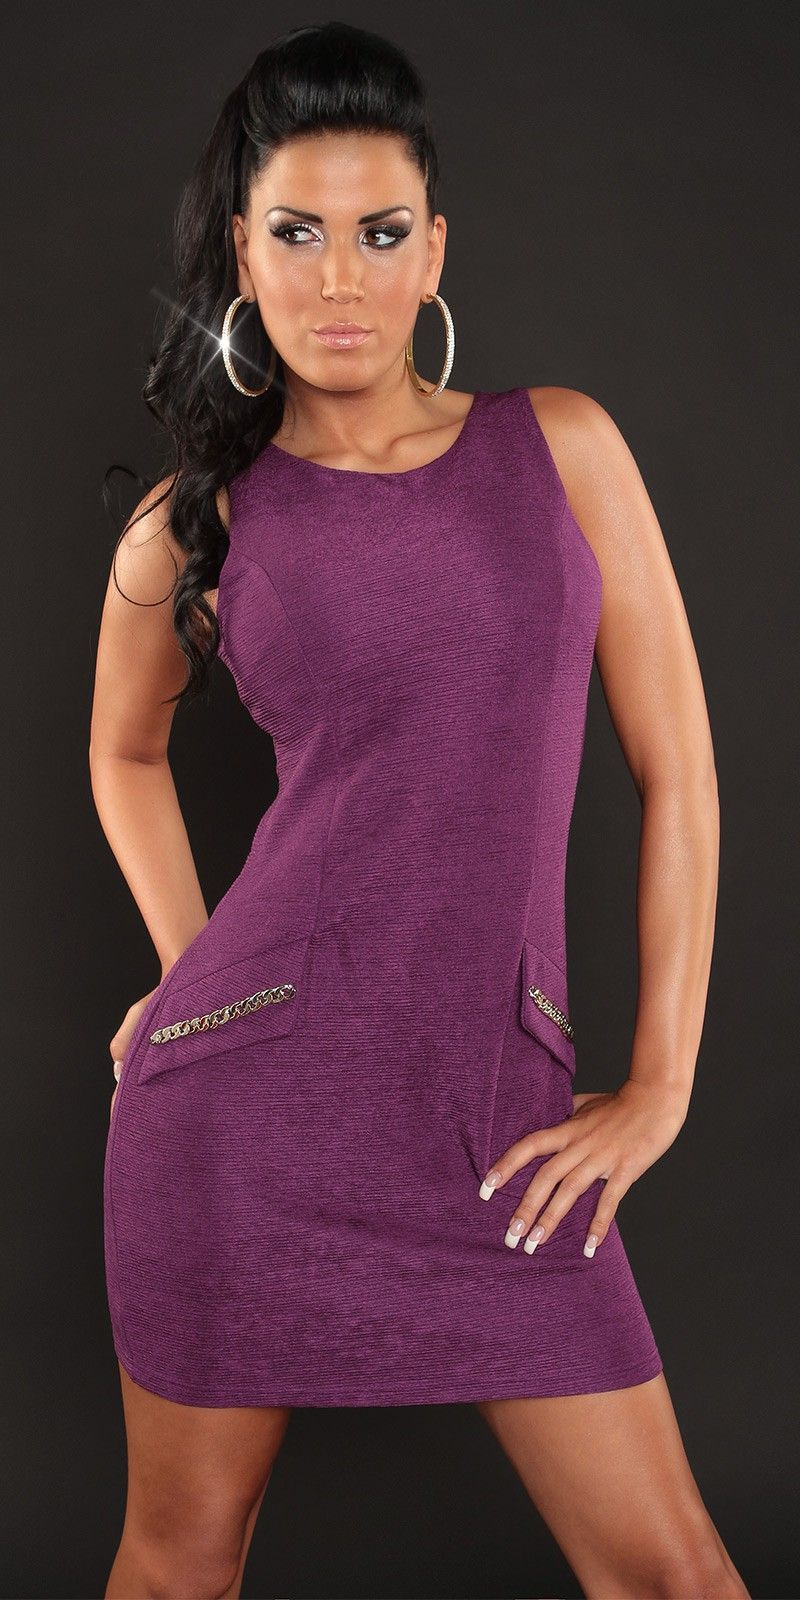 Vestido corto de asas color púrpura. | Mujeres, moda, diseño ...